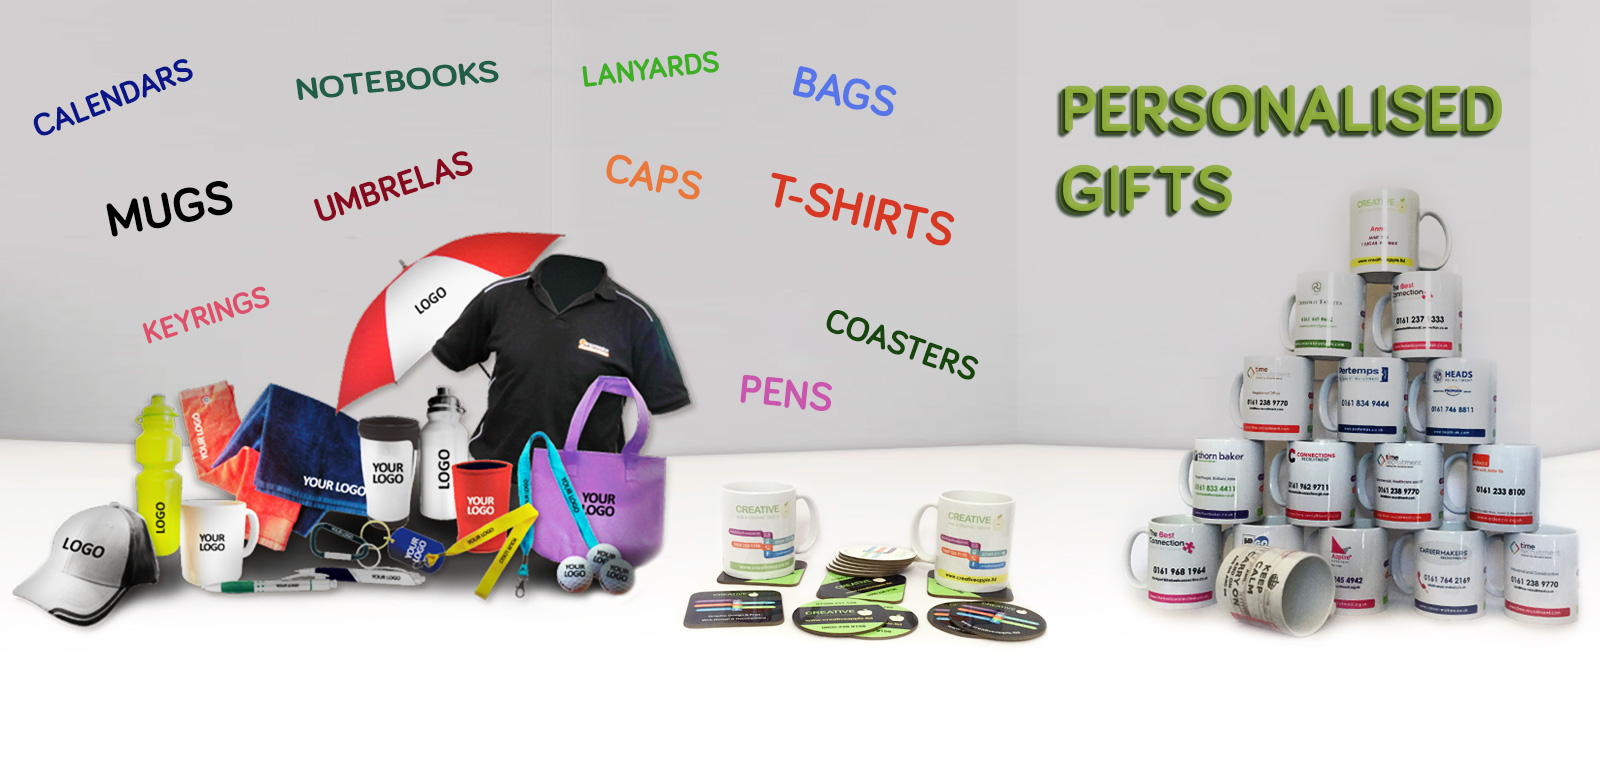 Personalised mugs, t-shirts, coasters, pens, calendars